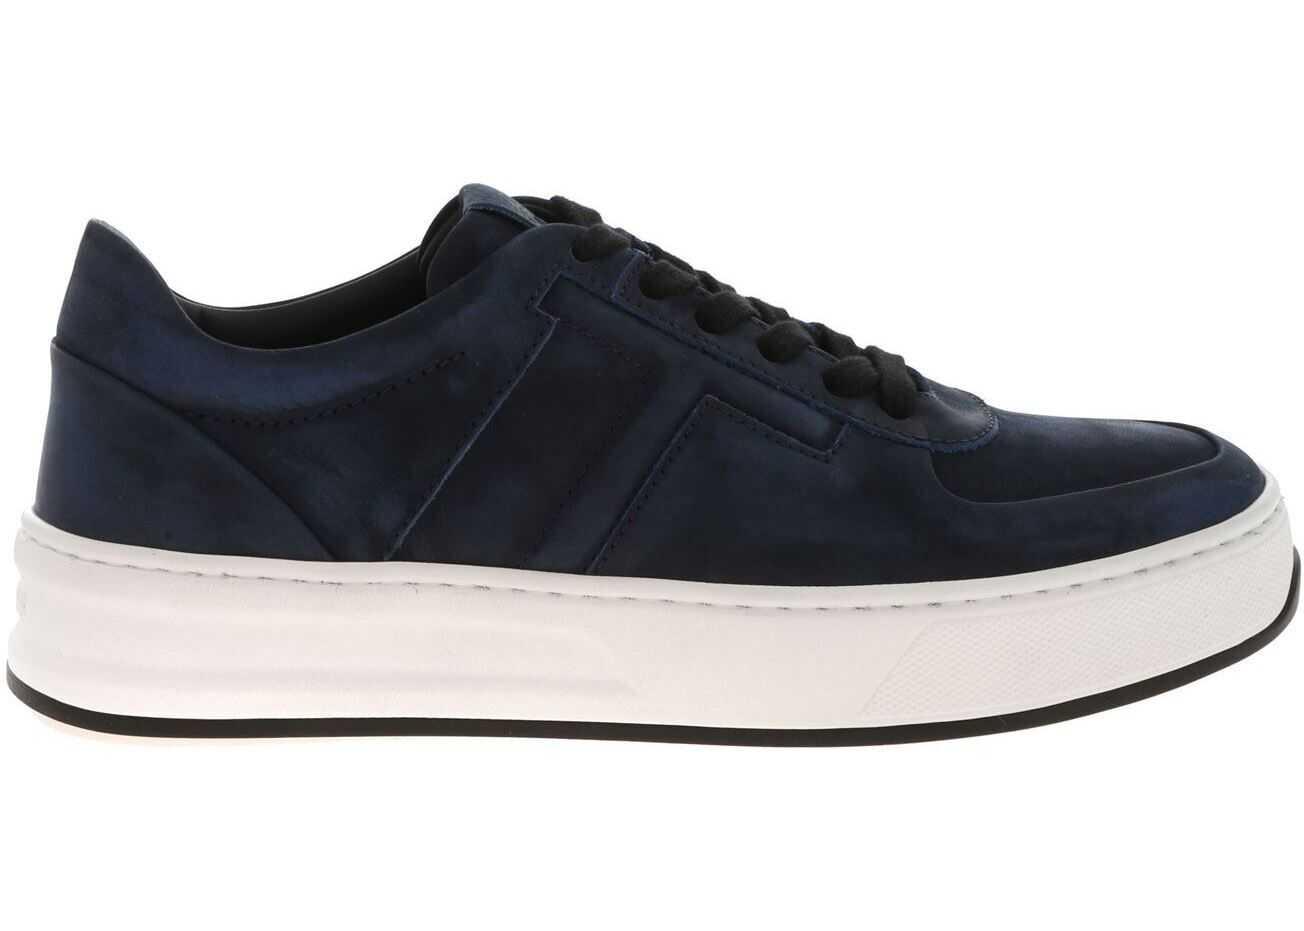 TOD'S Vintage-Effect Sneakers In Blue Blue